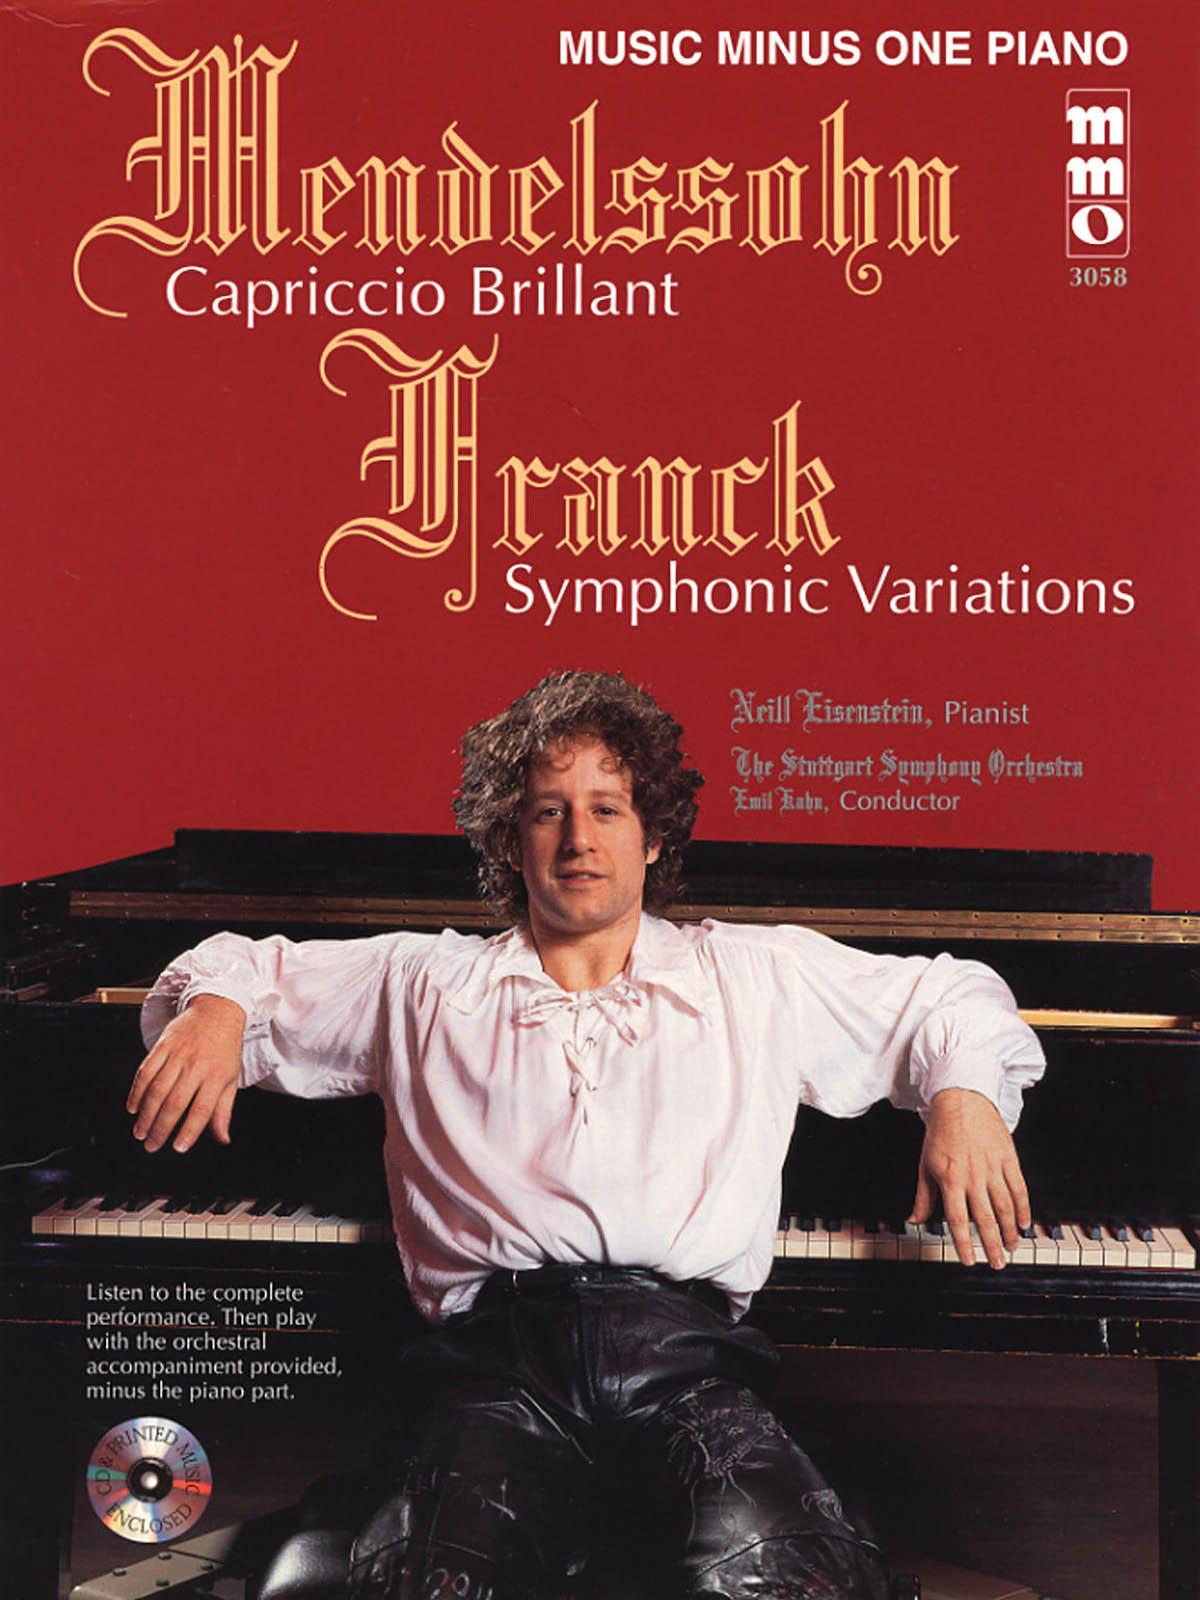 Felix Mendelssohn Bartholdy Franck: Capriccio Brilliant - Variations